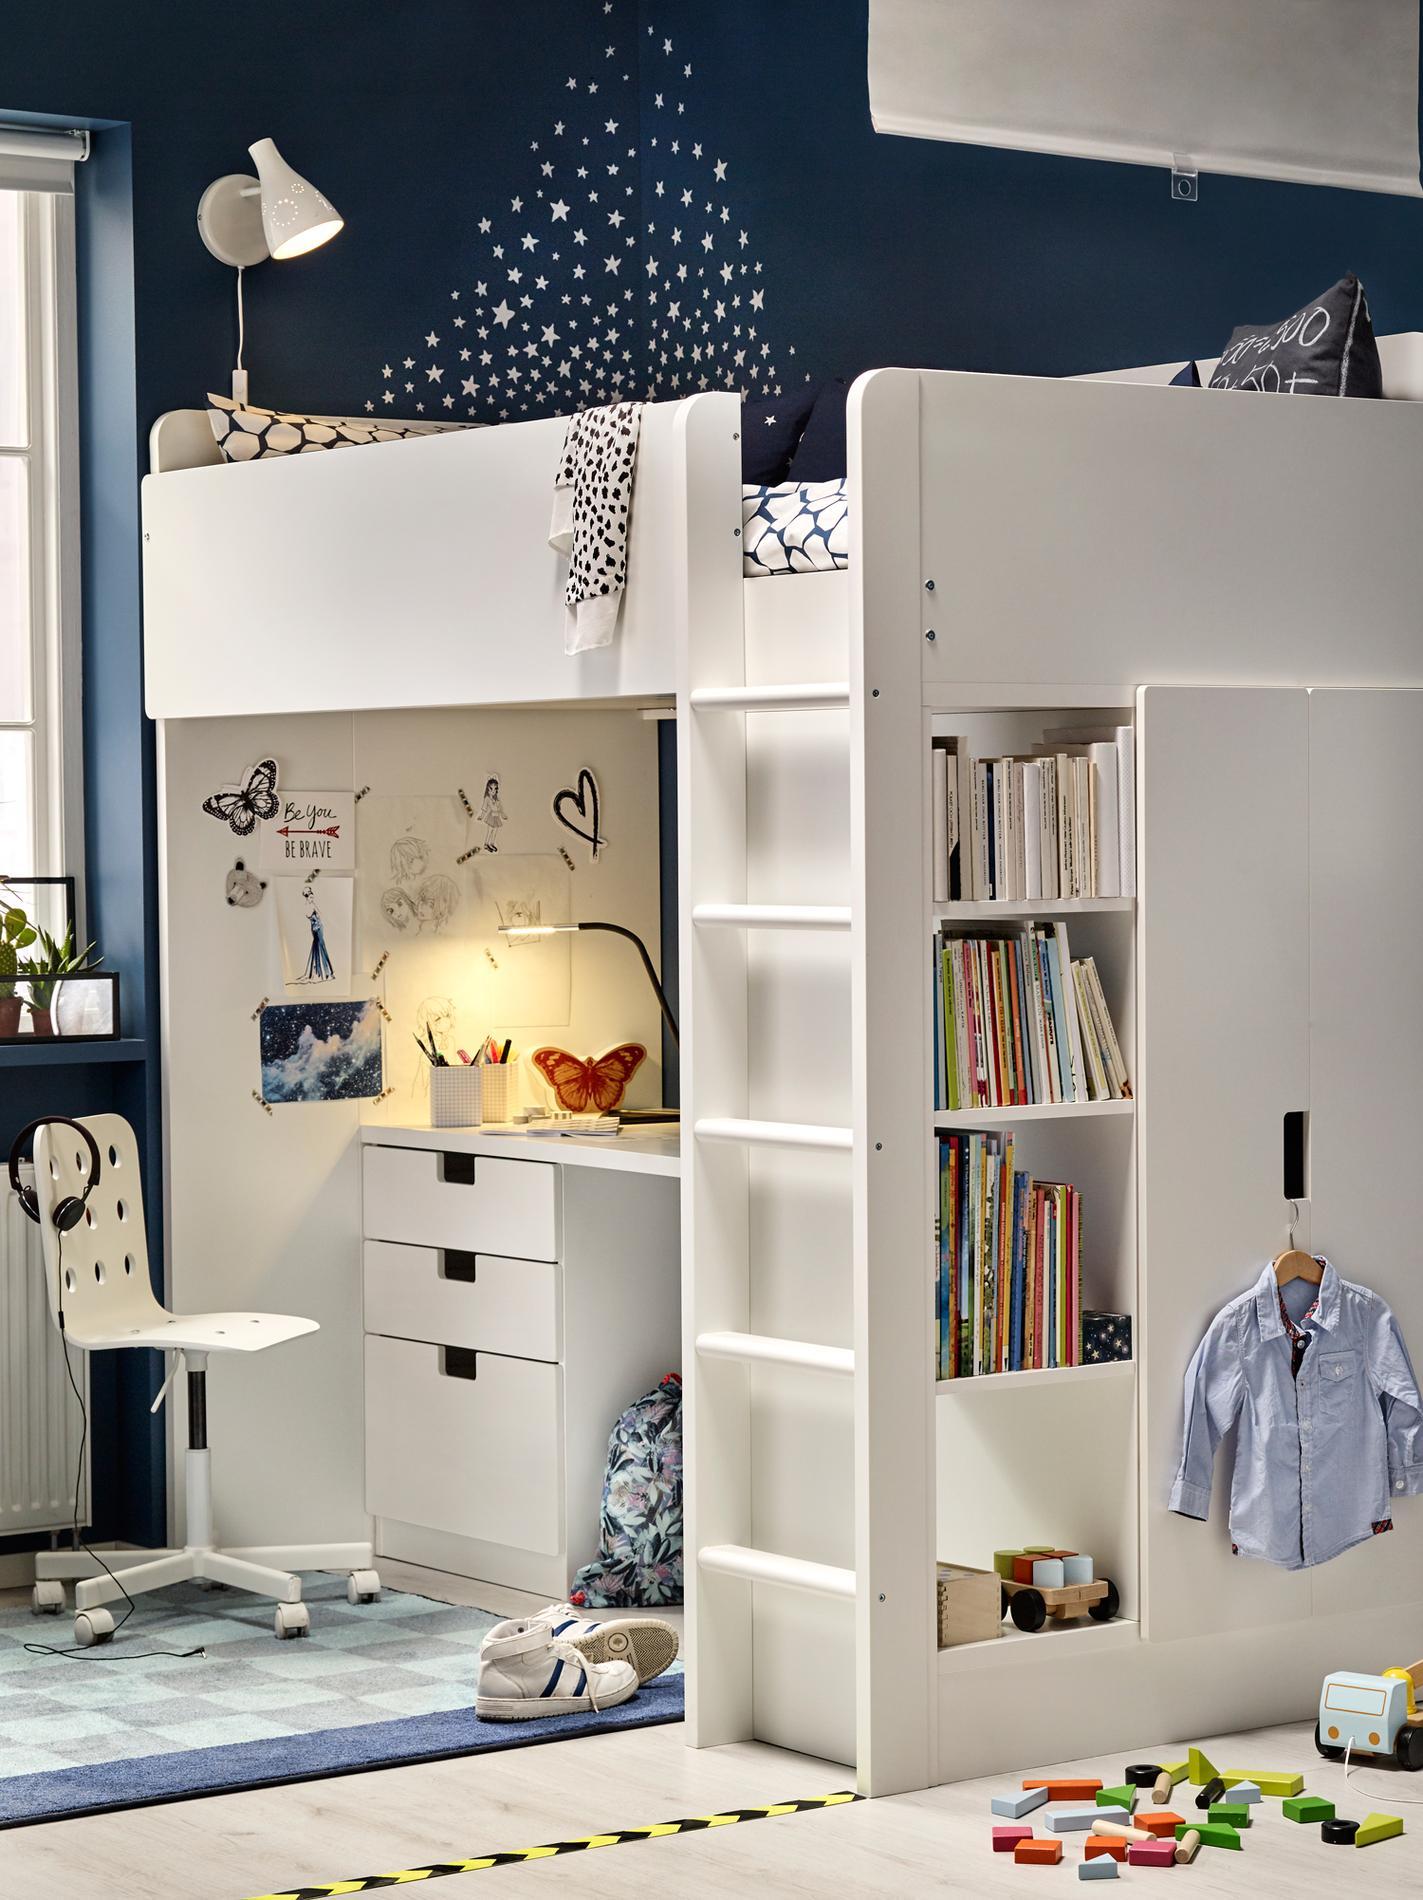 lit mezzanine ado ikea excellent ikea chambre ado un lit. Black Bedroom Furniture Sets. Home Design Ideas